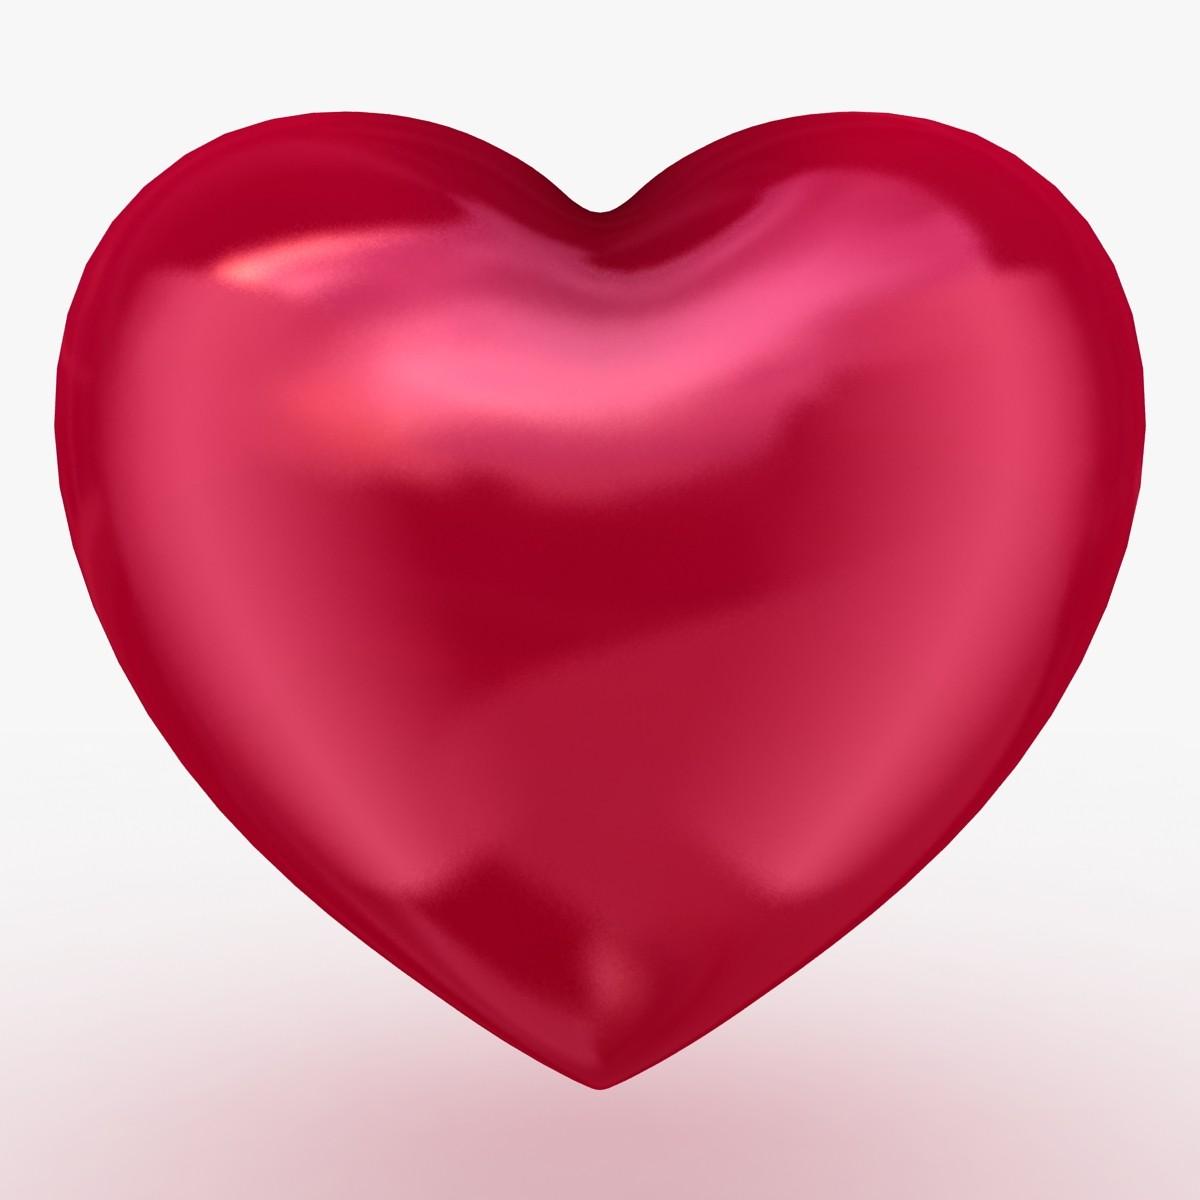 heart shape 3d models for download turbosquid